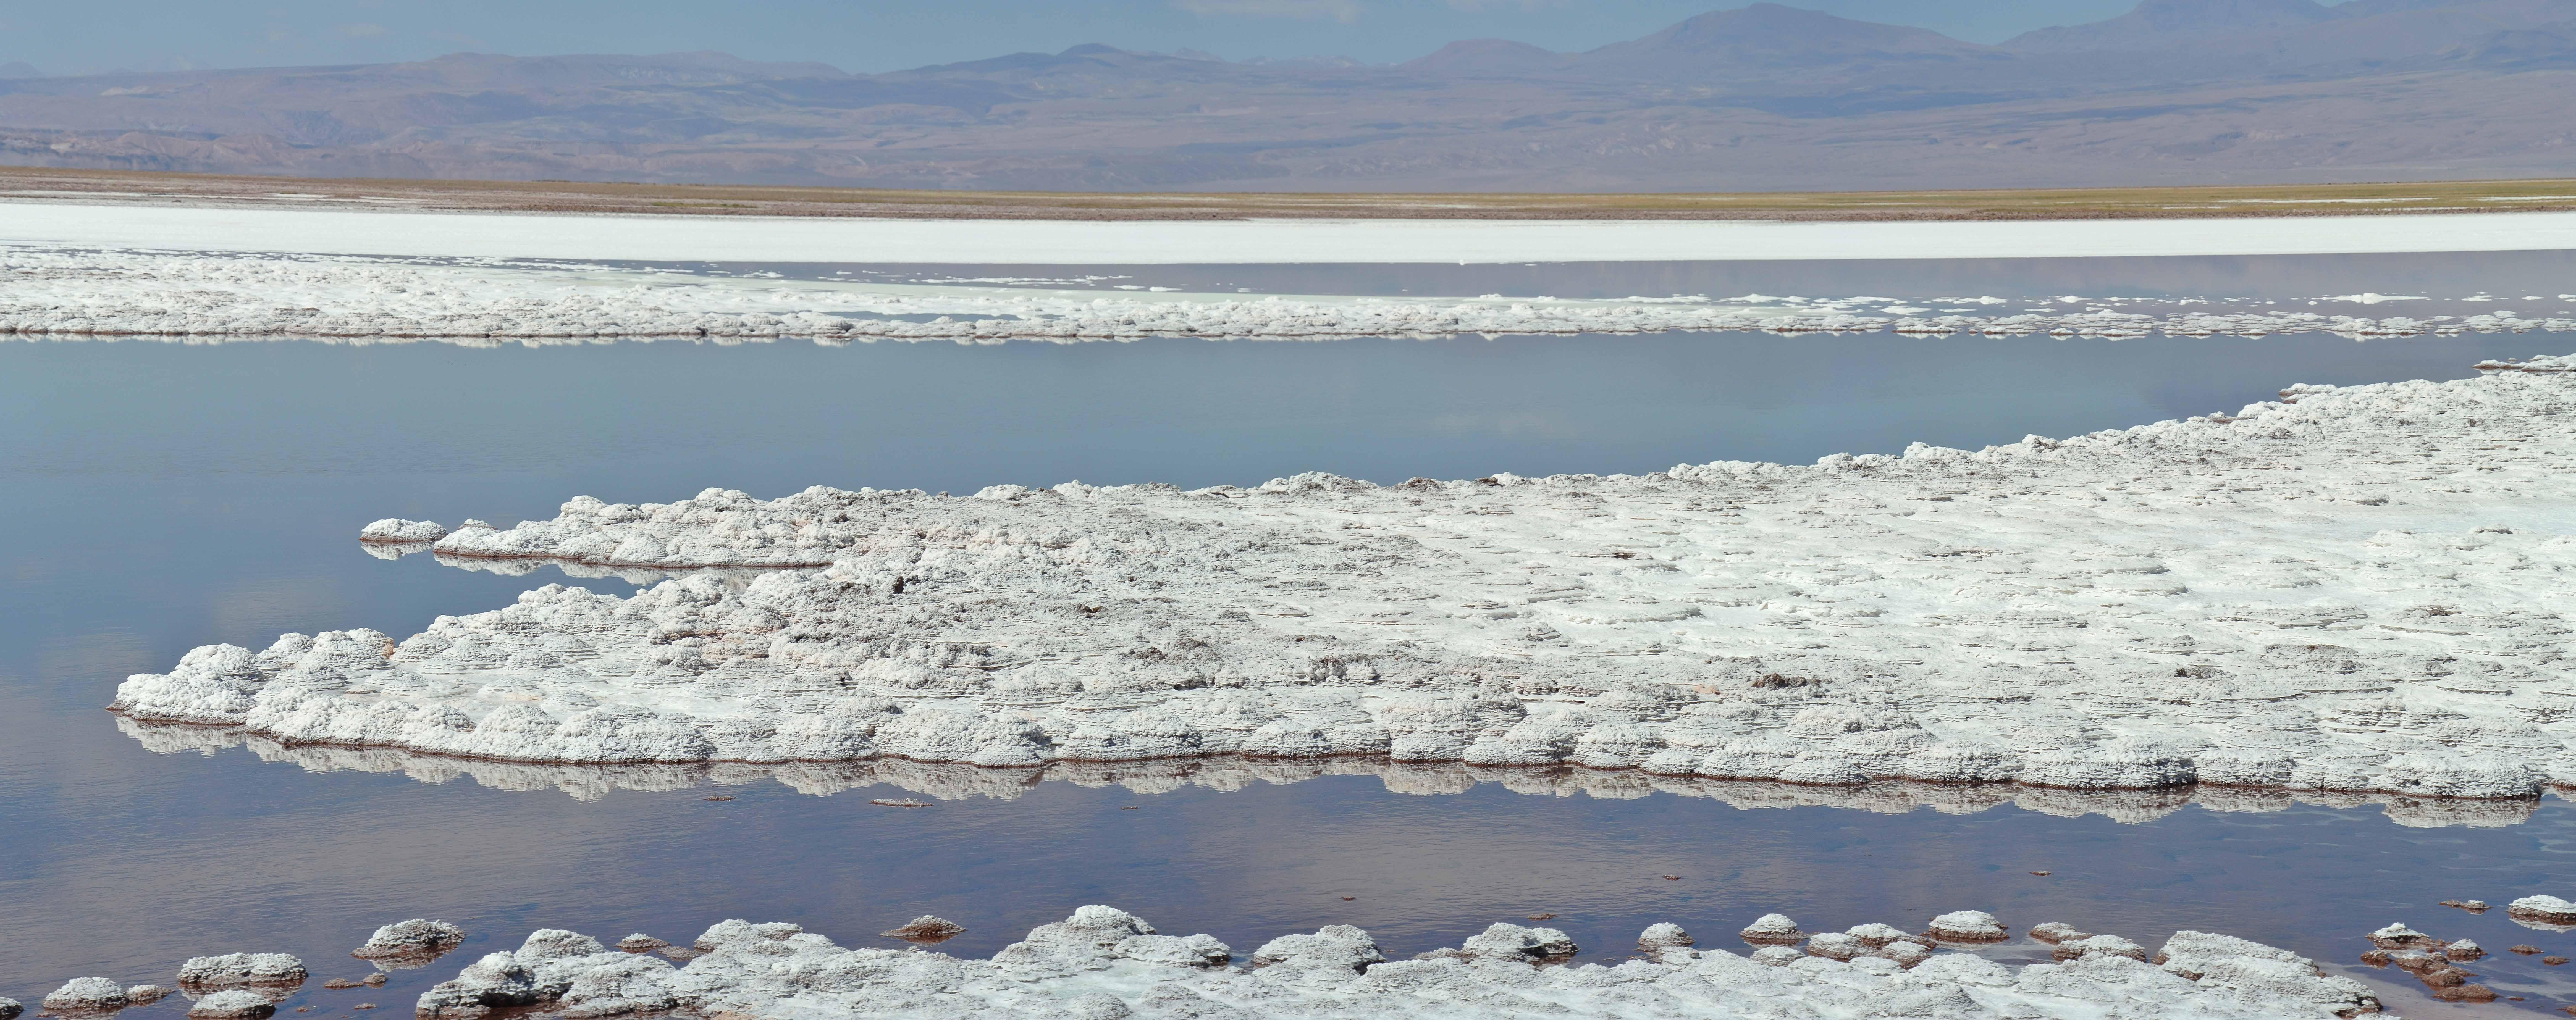 027 0912 Mirador - Salar de Atacama 162JPG